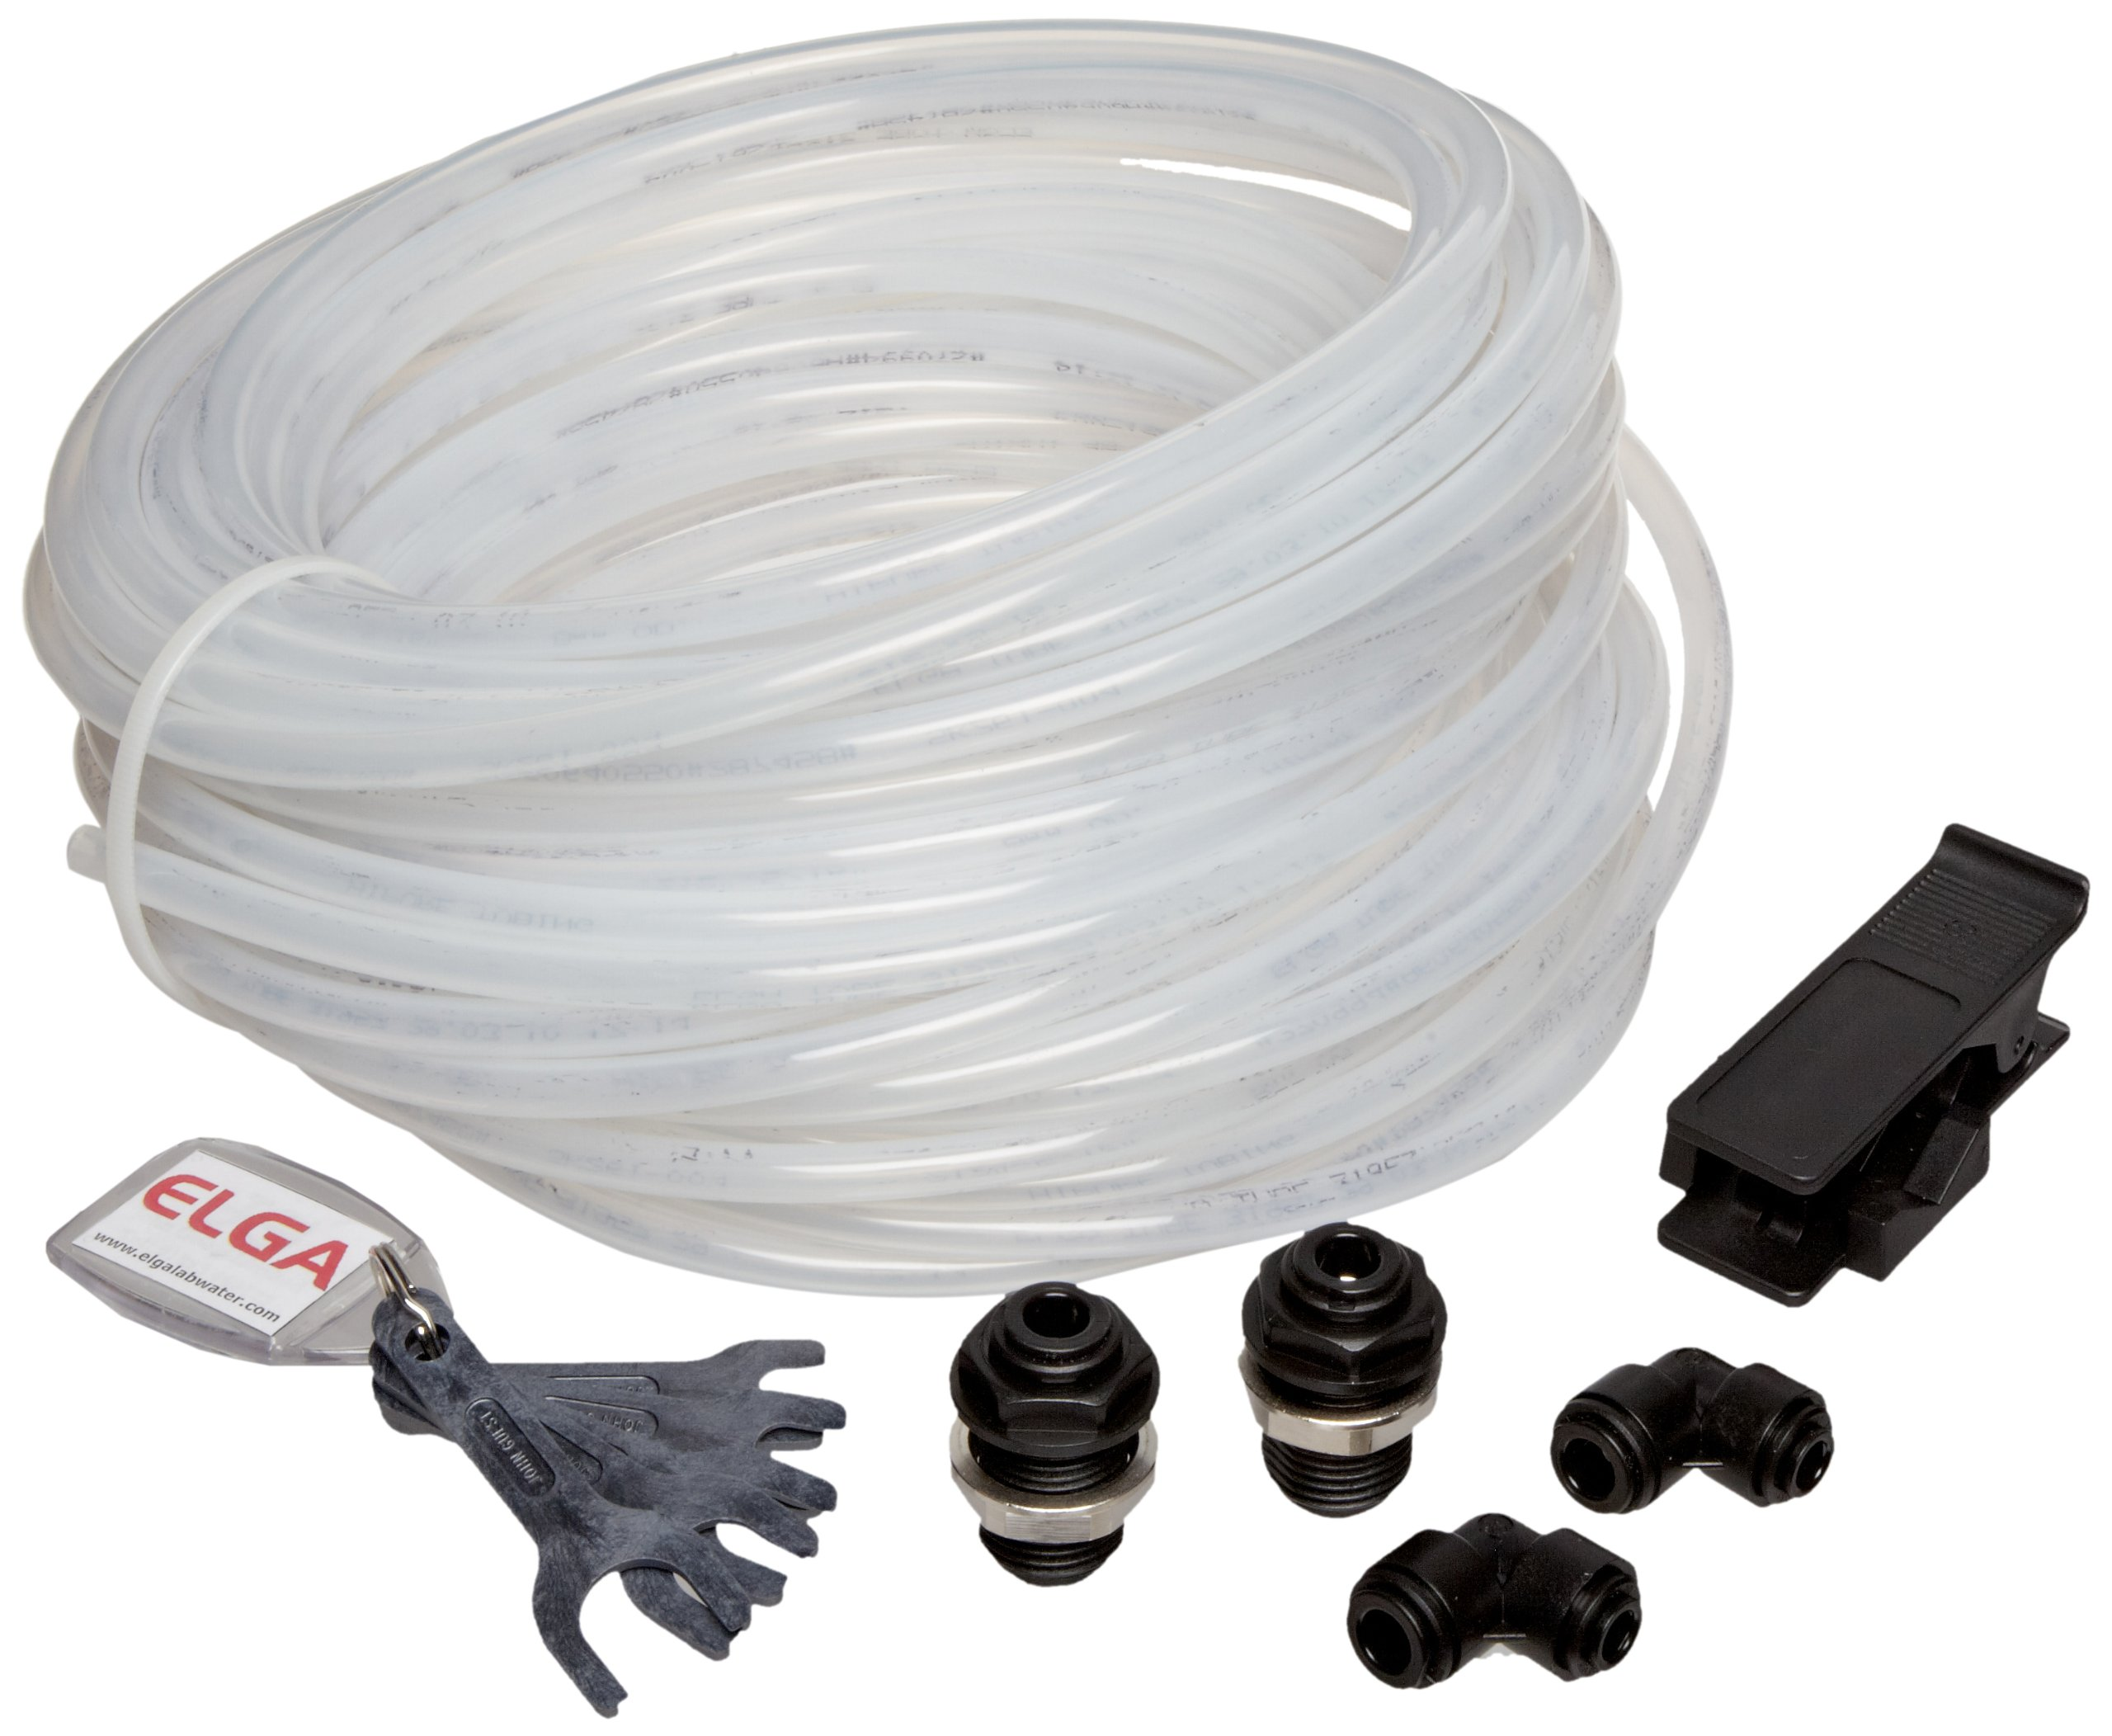 Elga LA647 Closed Circuit Ringmain Kit